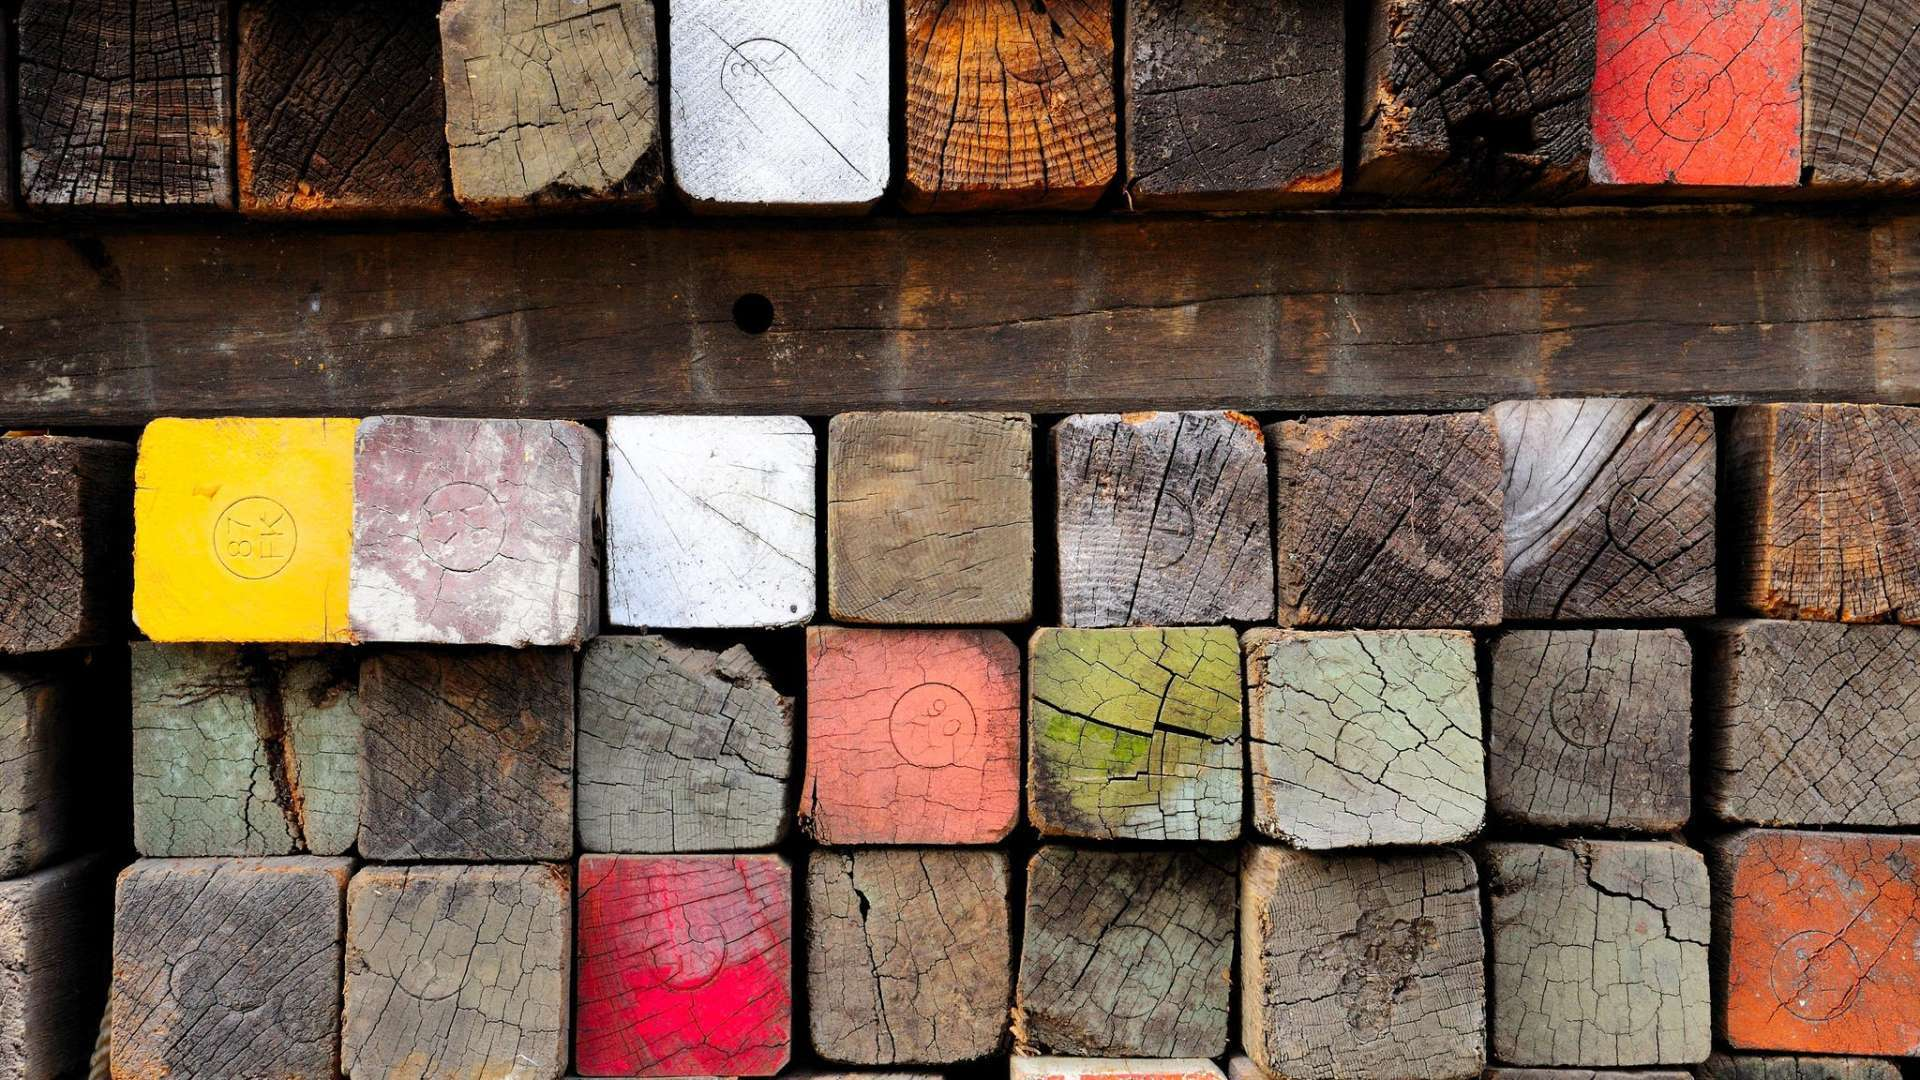 Hd Wallpapers 1080p Colors Wallpaper Cave